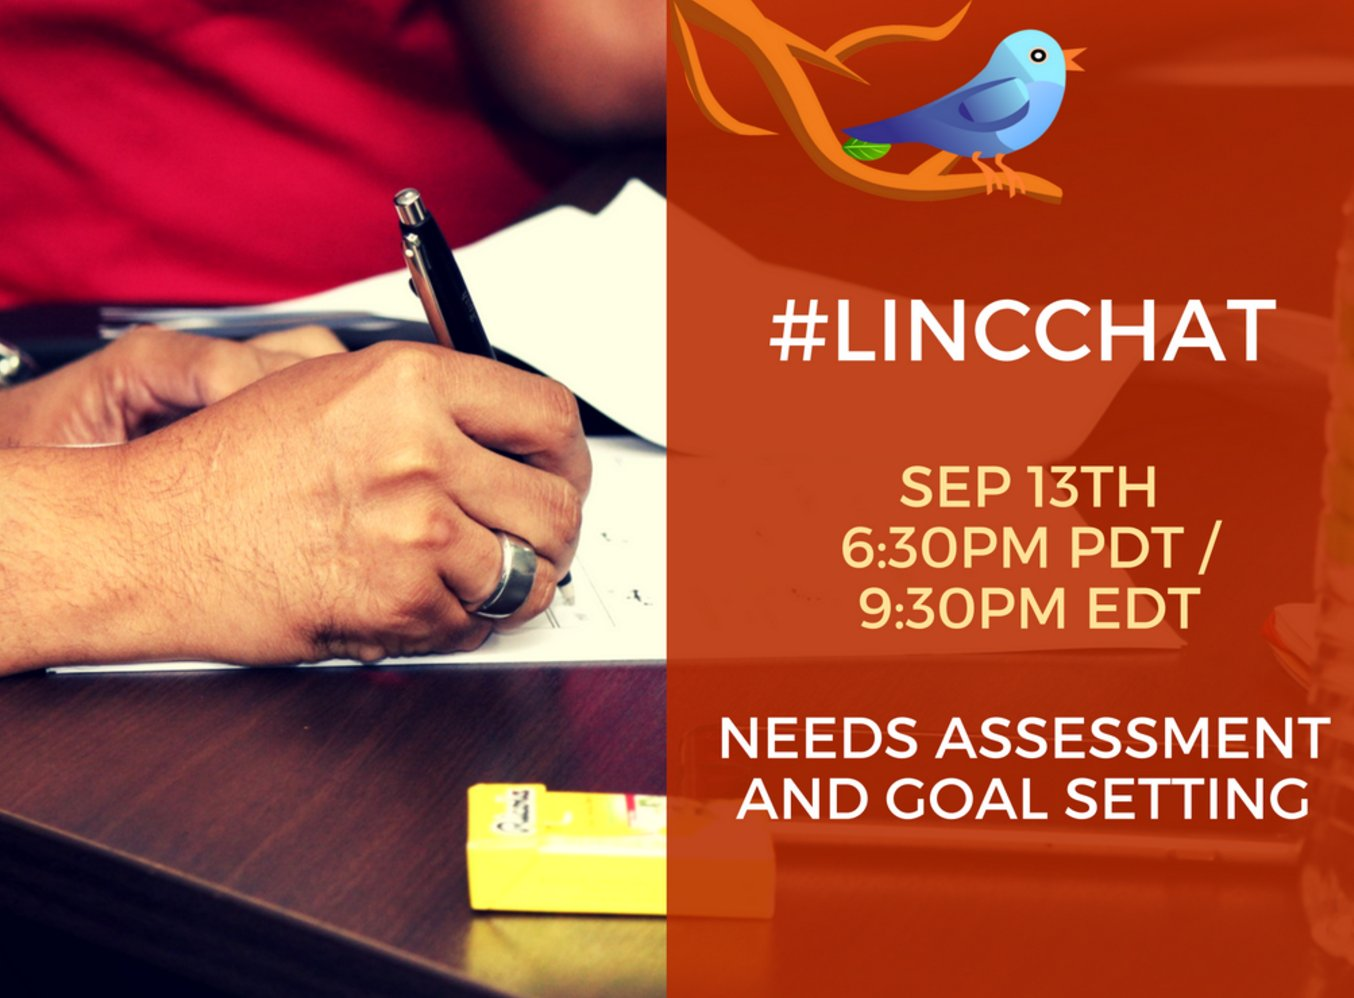 Join us Sept 13 to share & learn about Needs Assessment & Goal Setting ideas & practices #LINCchat #cdnesl #cdnelt https://t.co/gXSRnapKco